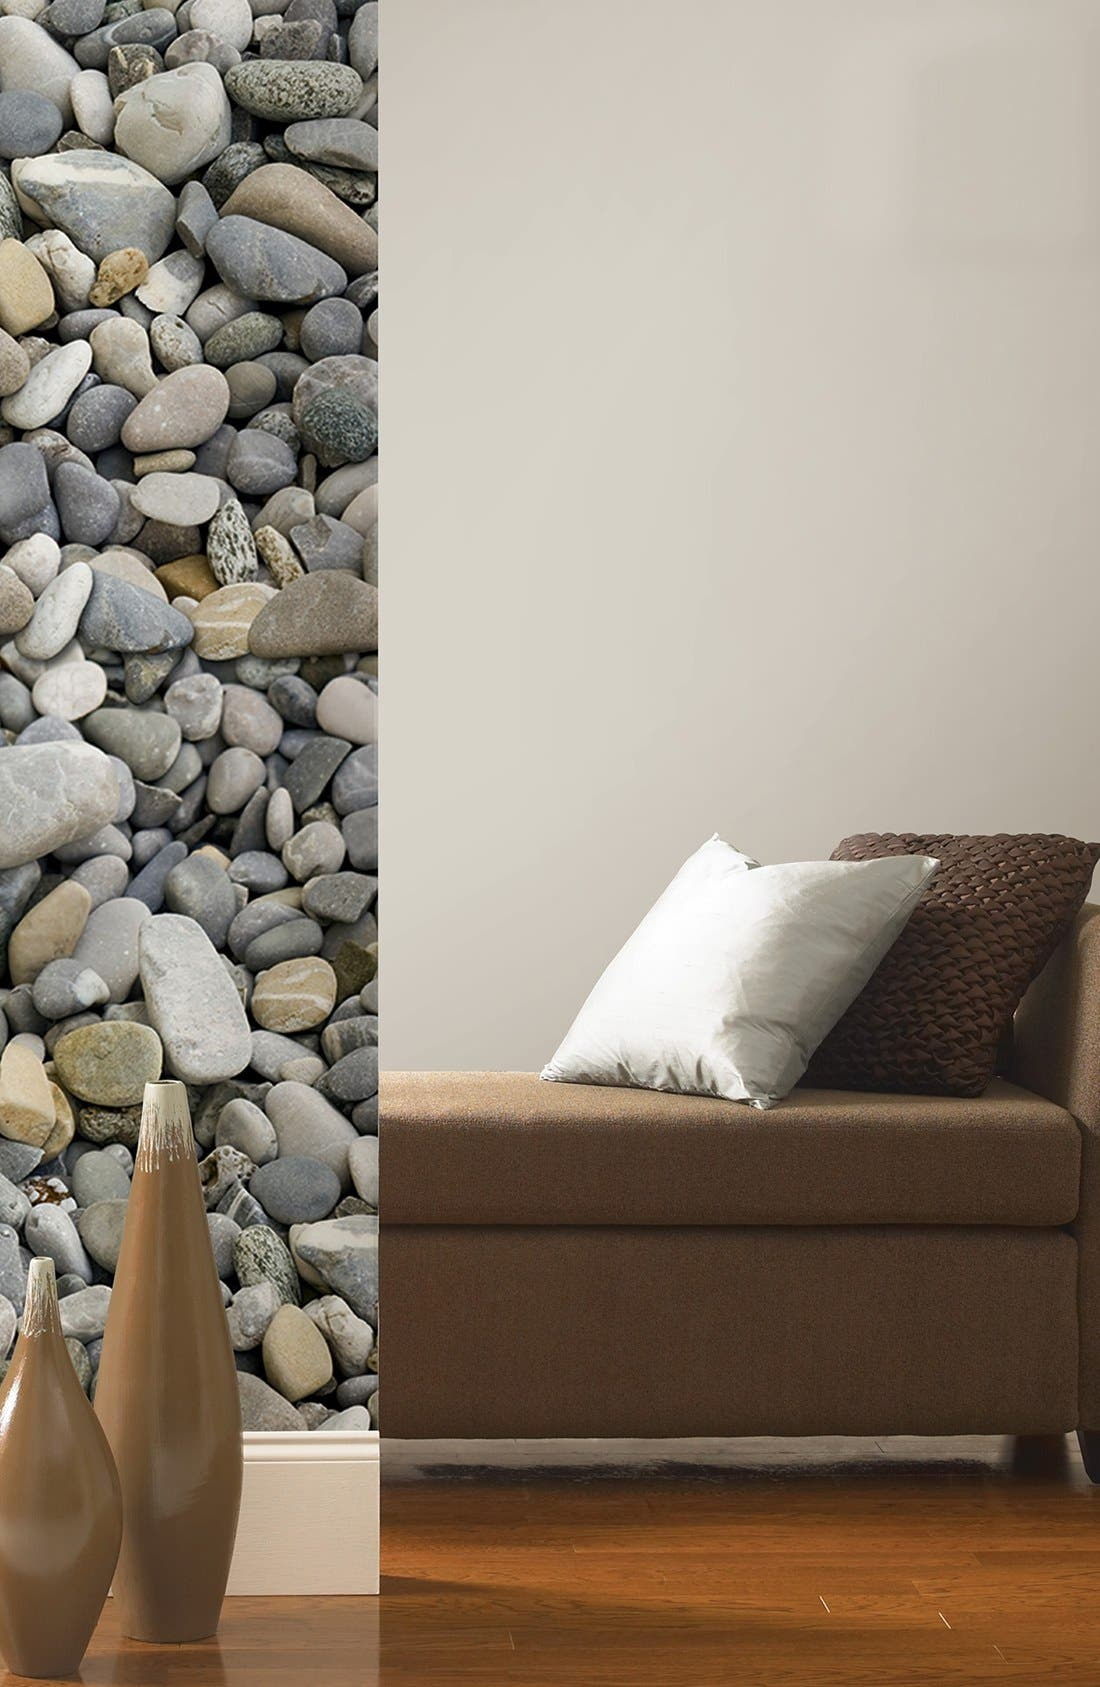 Alternate Image 1 Selected - Wallpops 'Pebbles' Wall Art